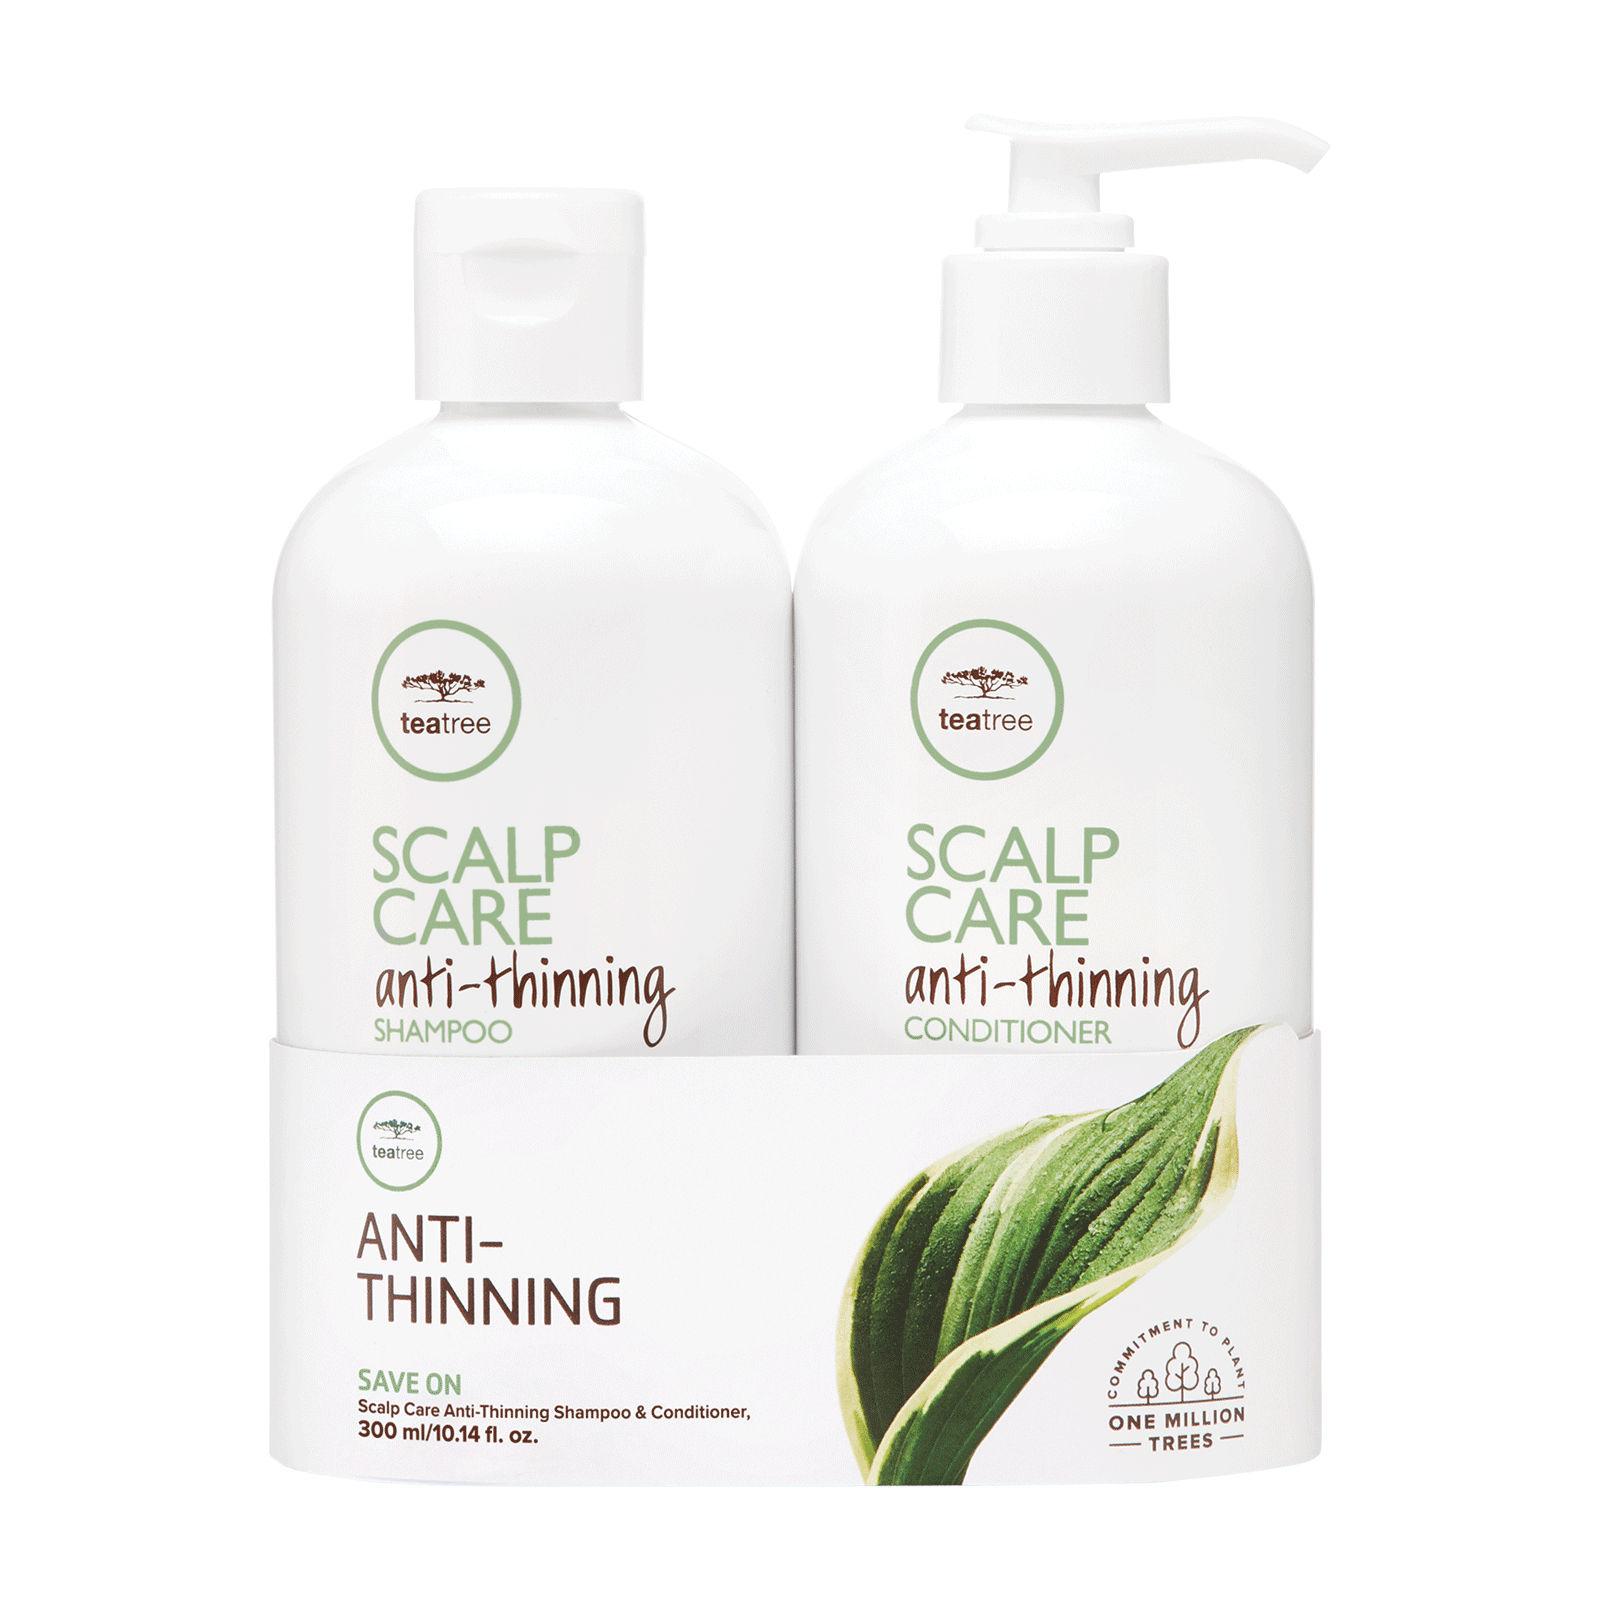 Paul Mitchell Tea Tree Scalp Care Anti Thinning Shampoo & Conditioner - 300ml